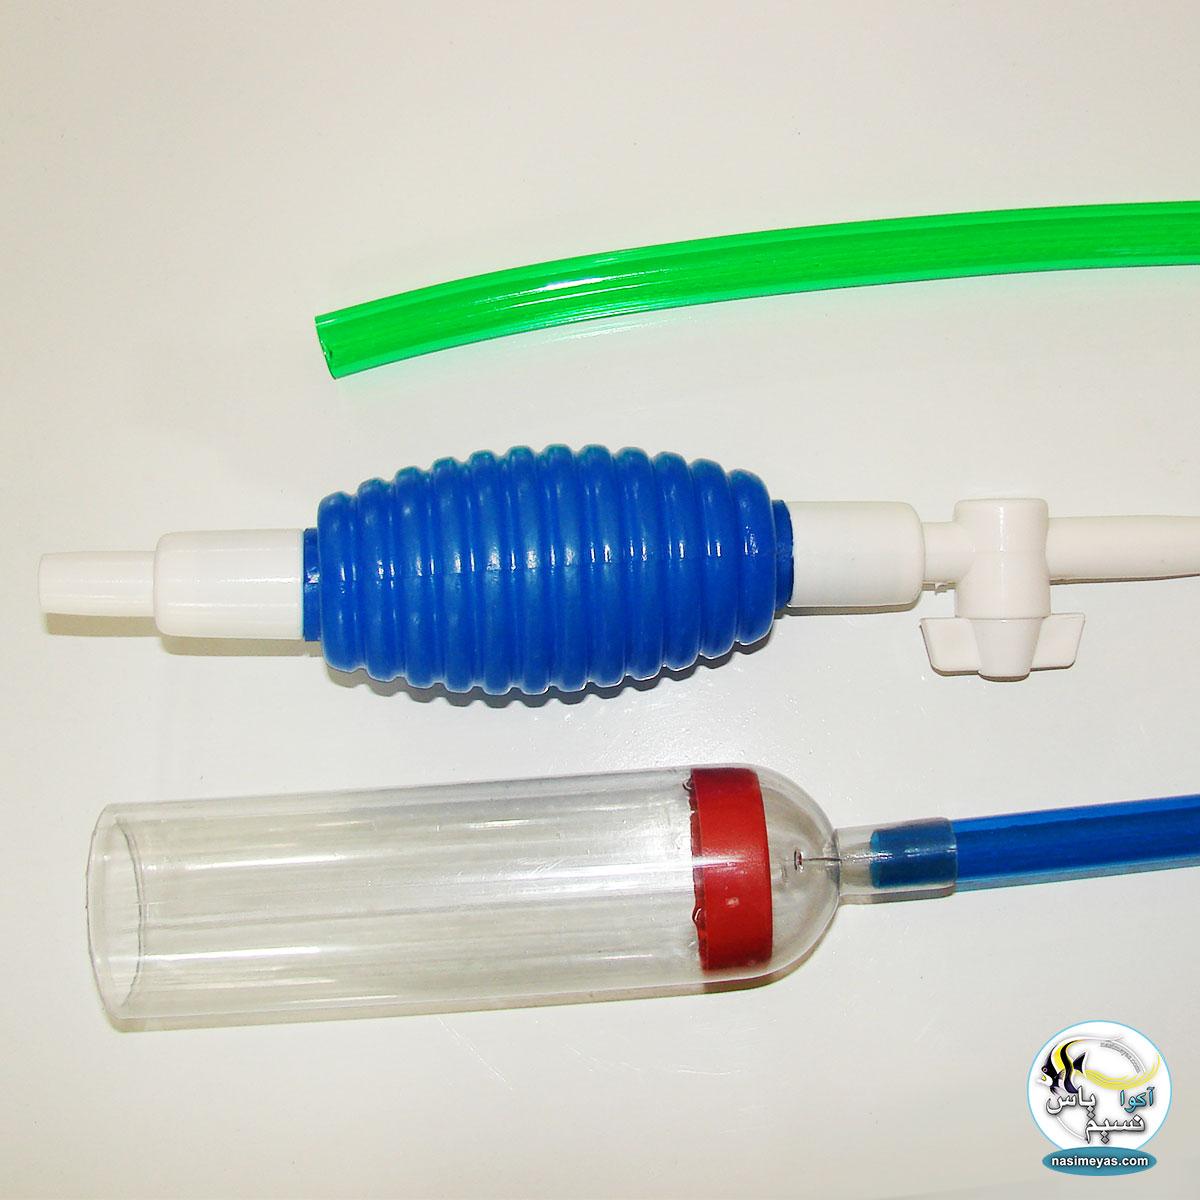 Ordinary siphon manually